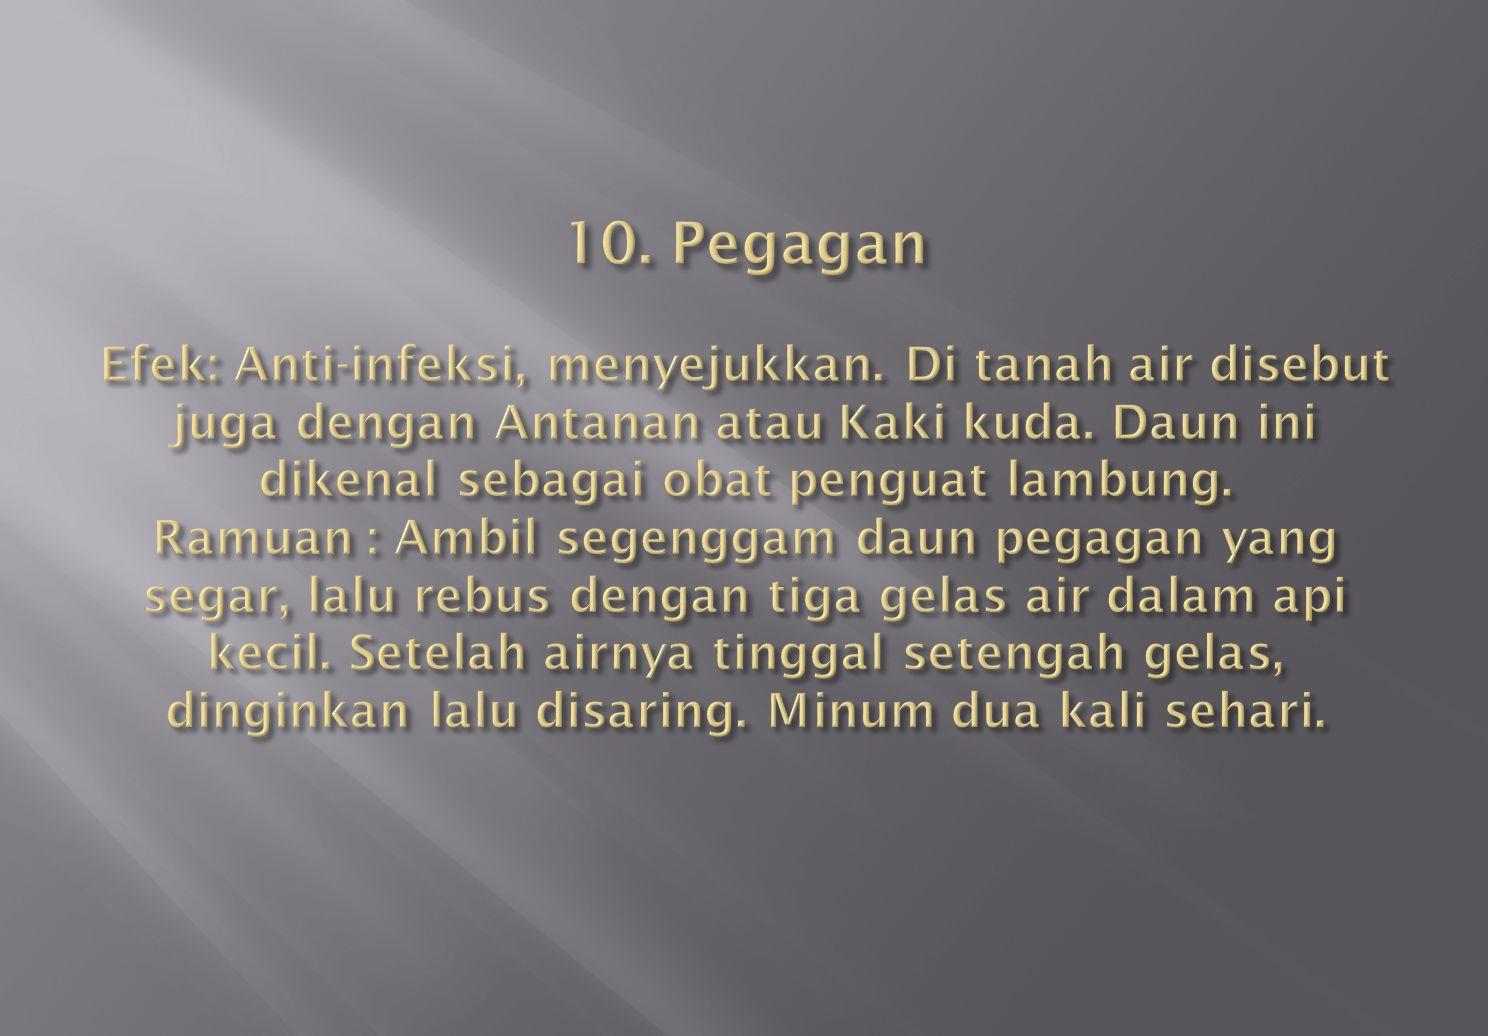 10. Pegagan Efek: Anti-infeksi, menyejukkan